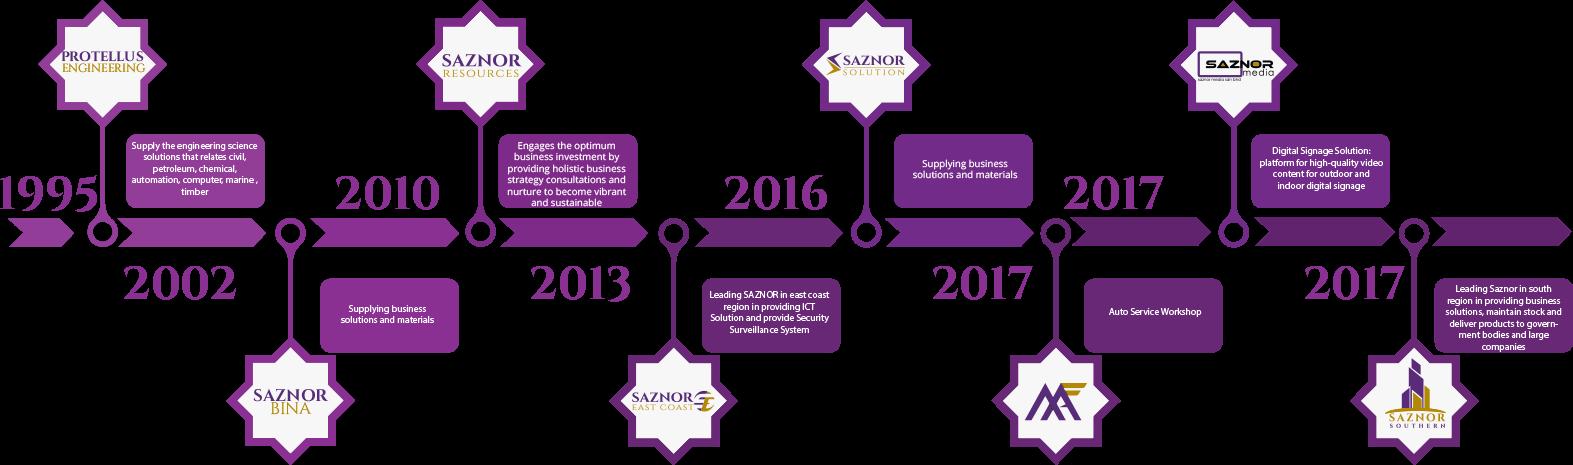 Saznor Holding Milestones